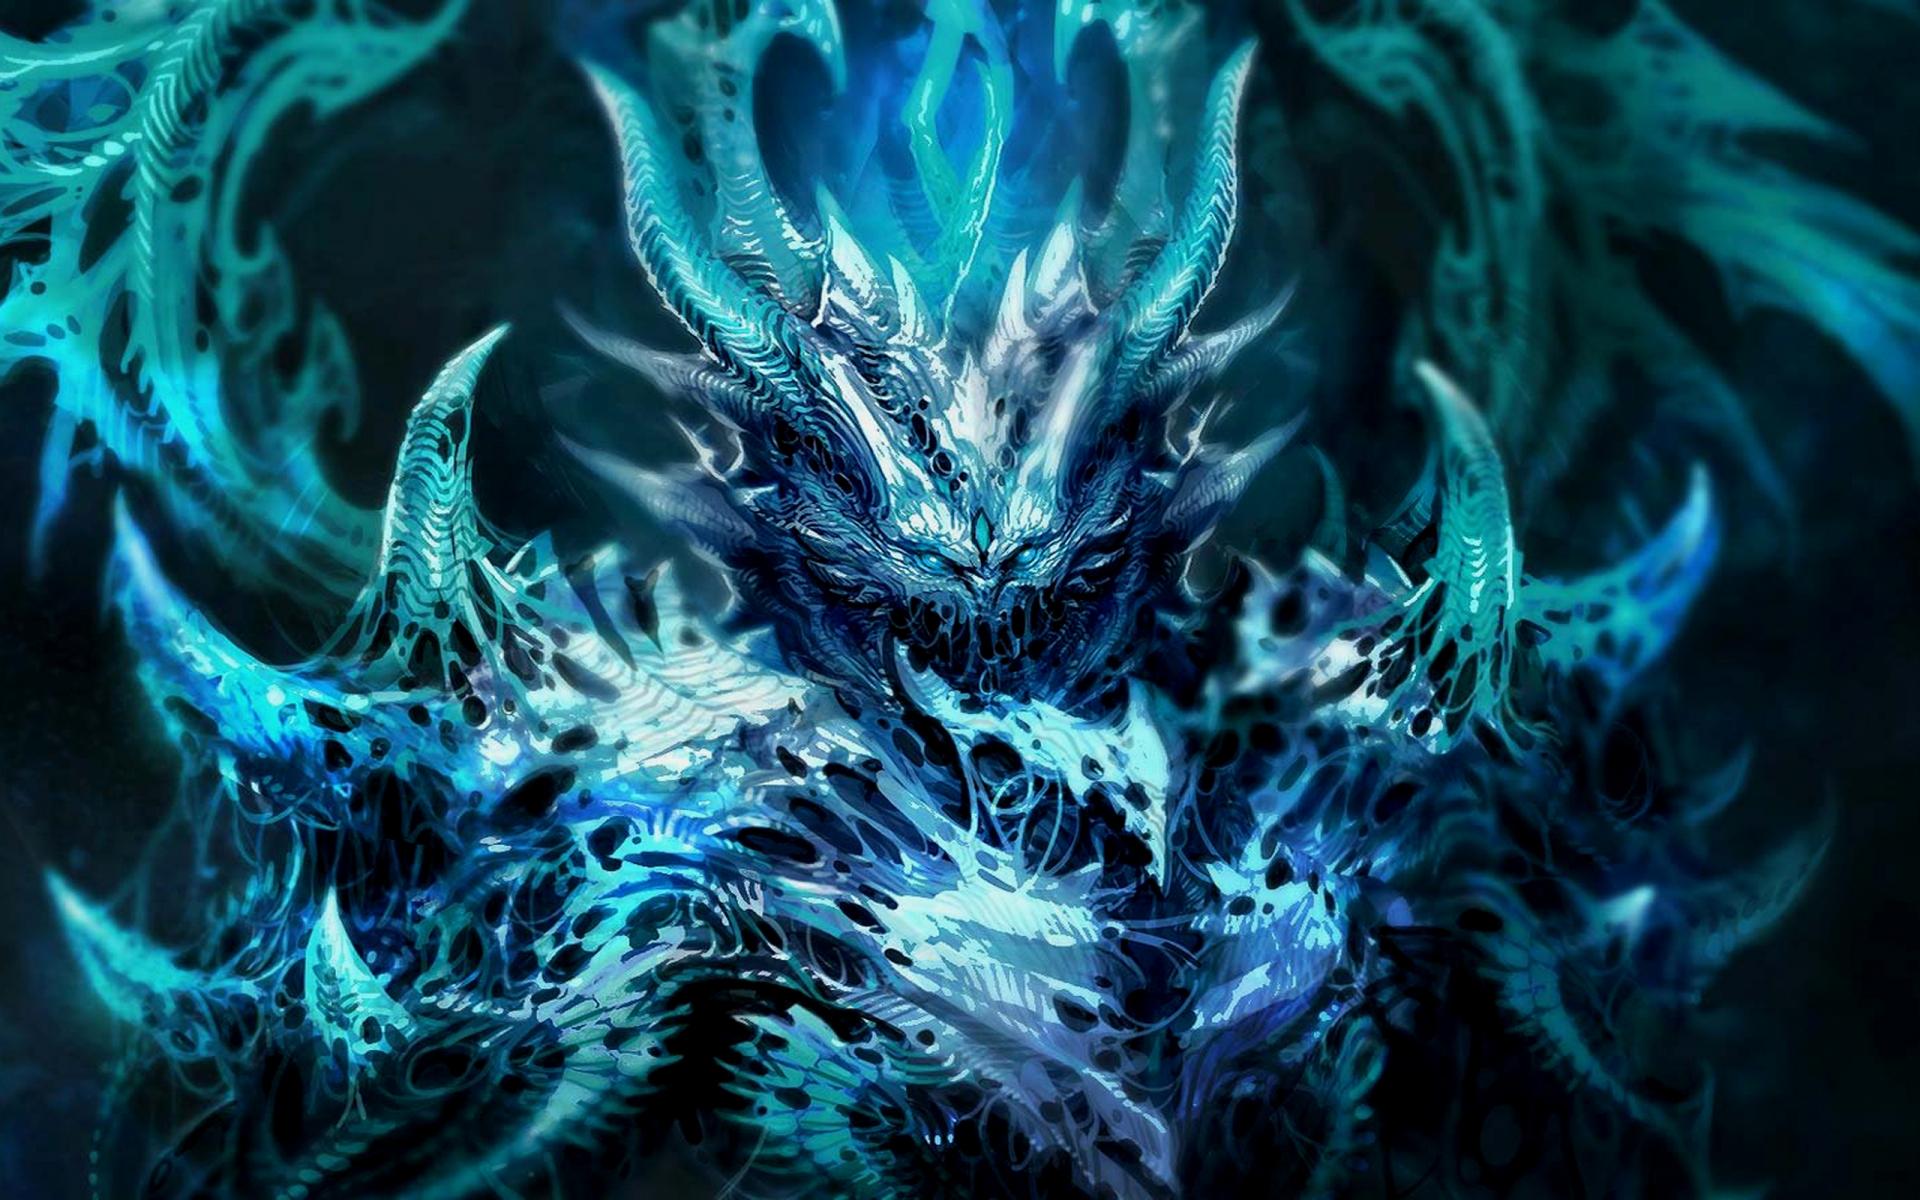 satan angel monster creature 3d magic horns blue art evil wallpaper 1920x1200